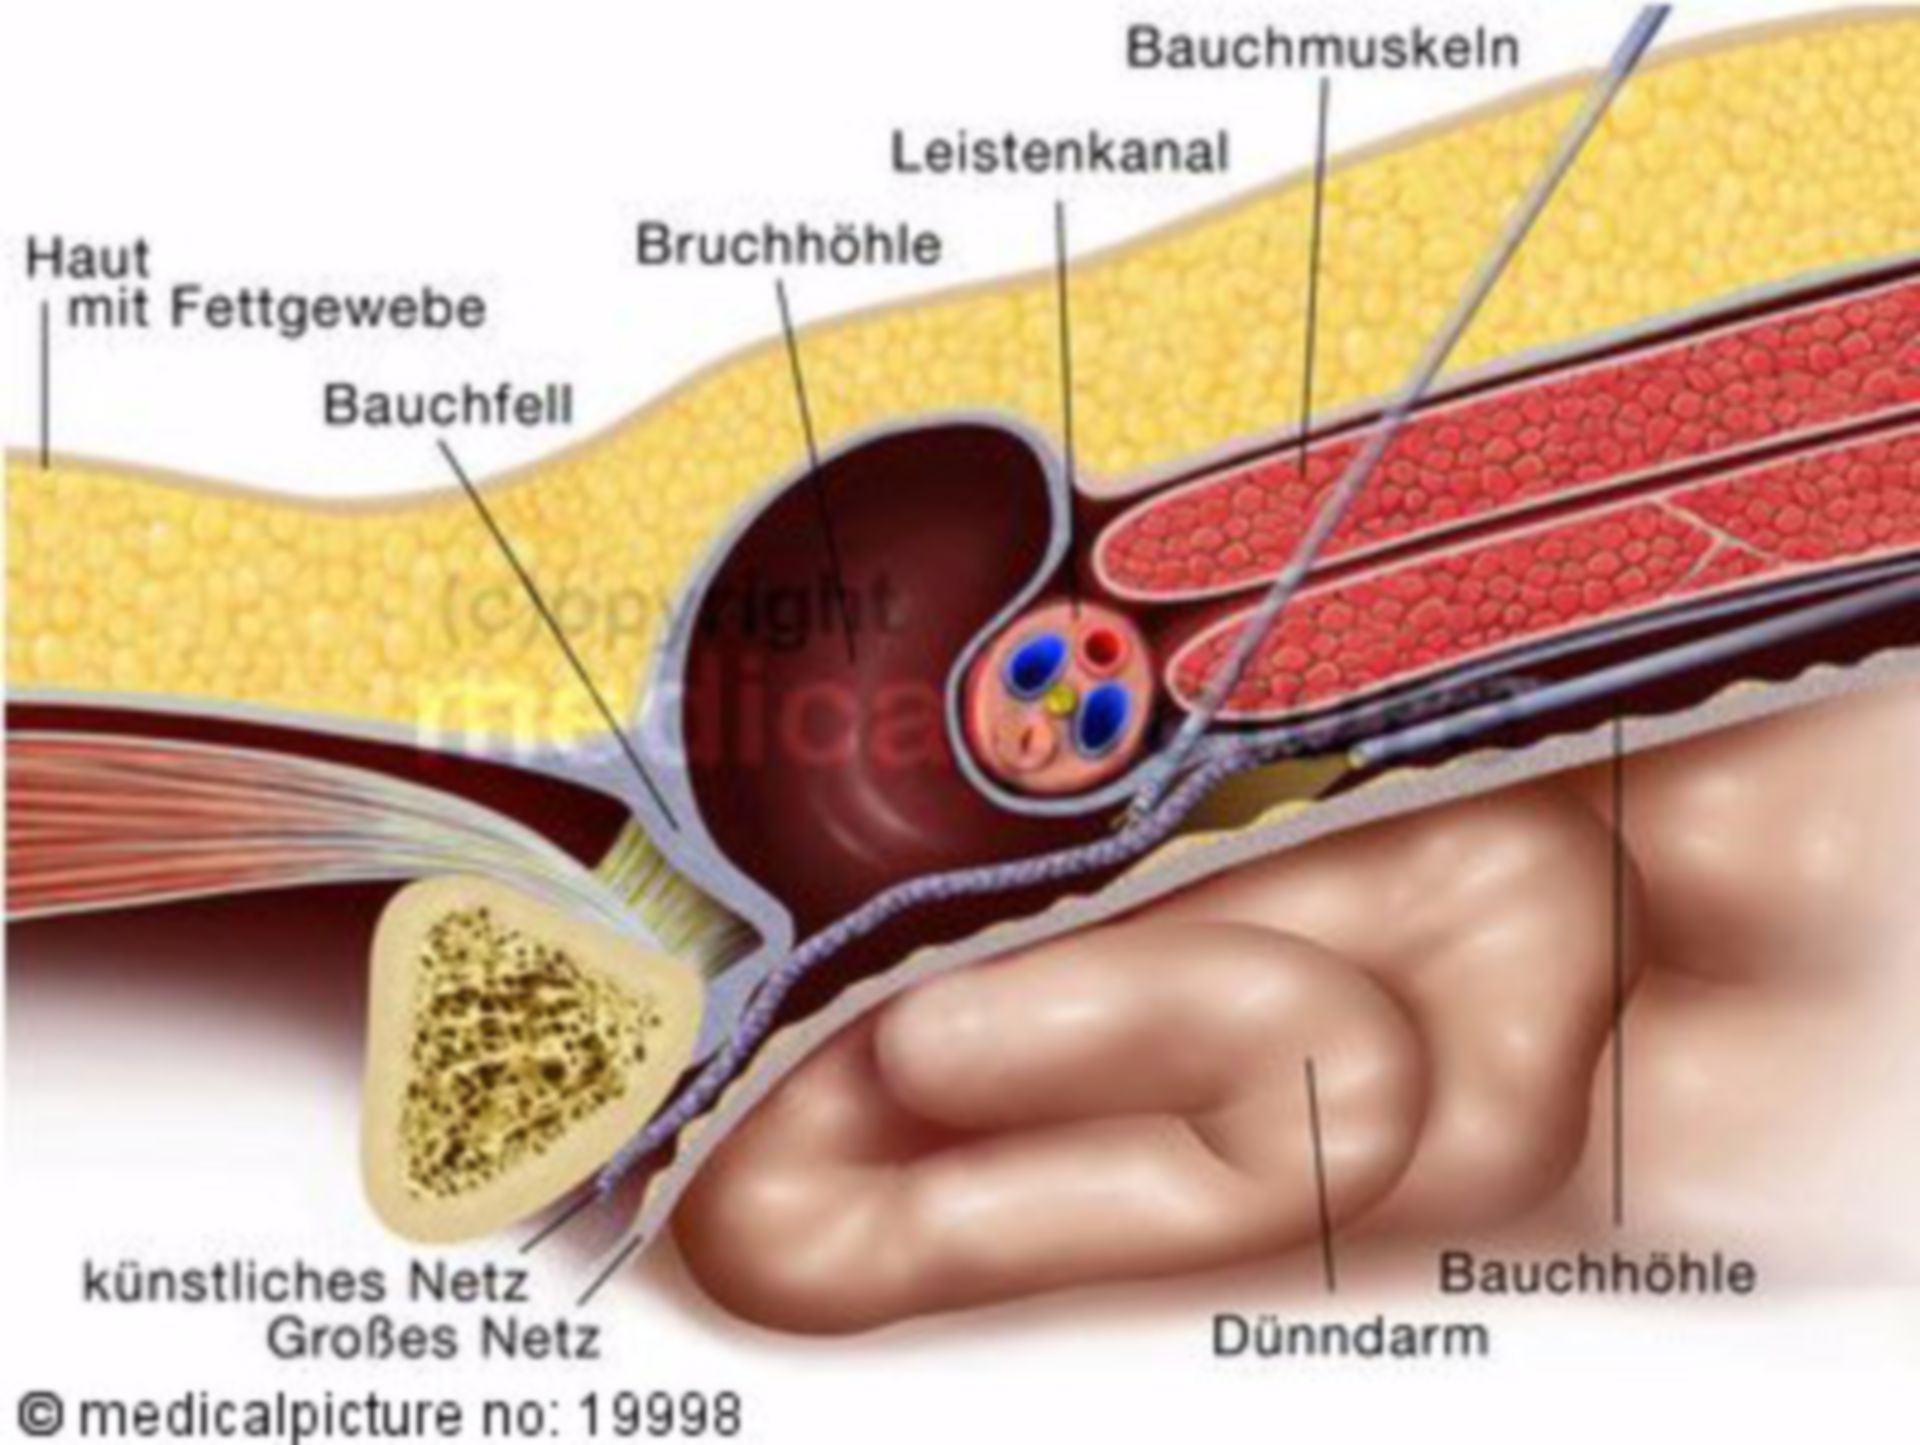 Inguinal hernia, minimally invasive surgery